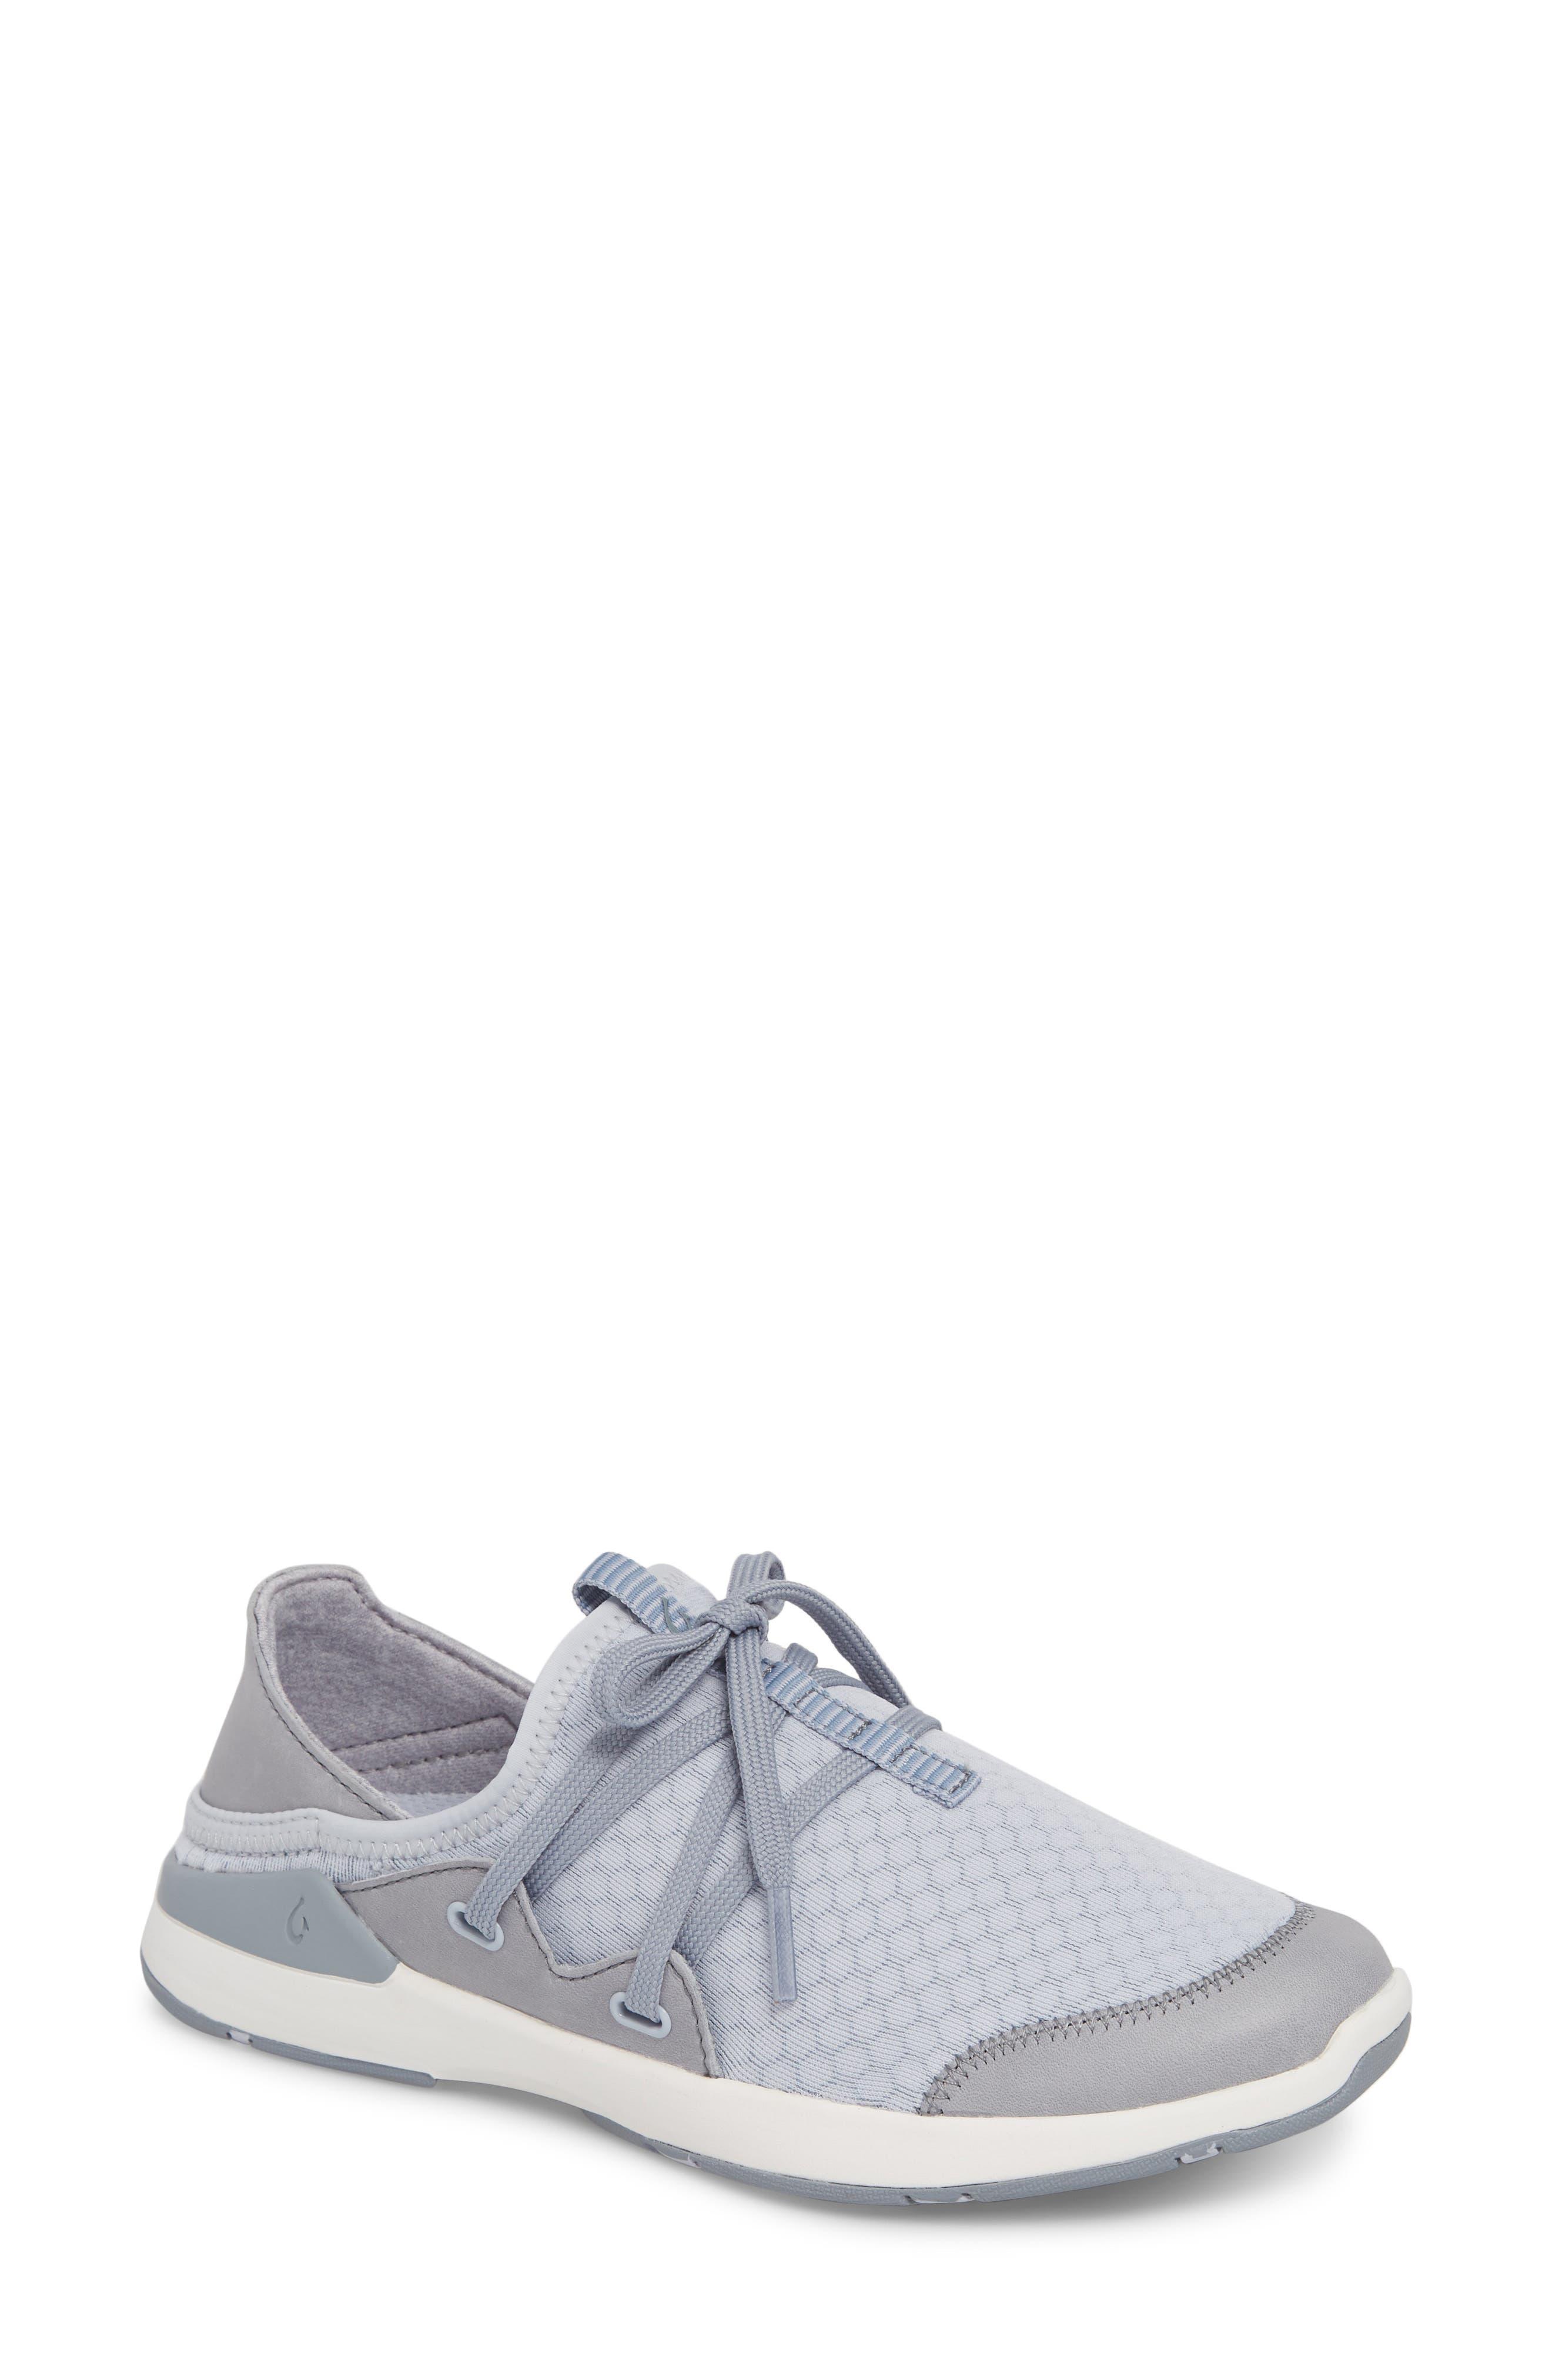 Olukai Miki Li Convertible Sneaker, Blue